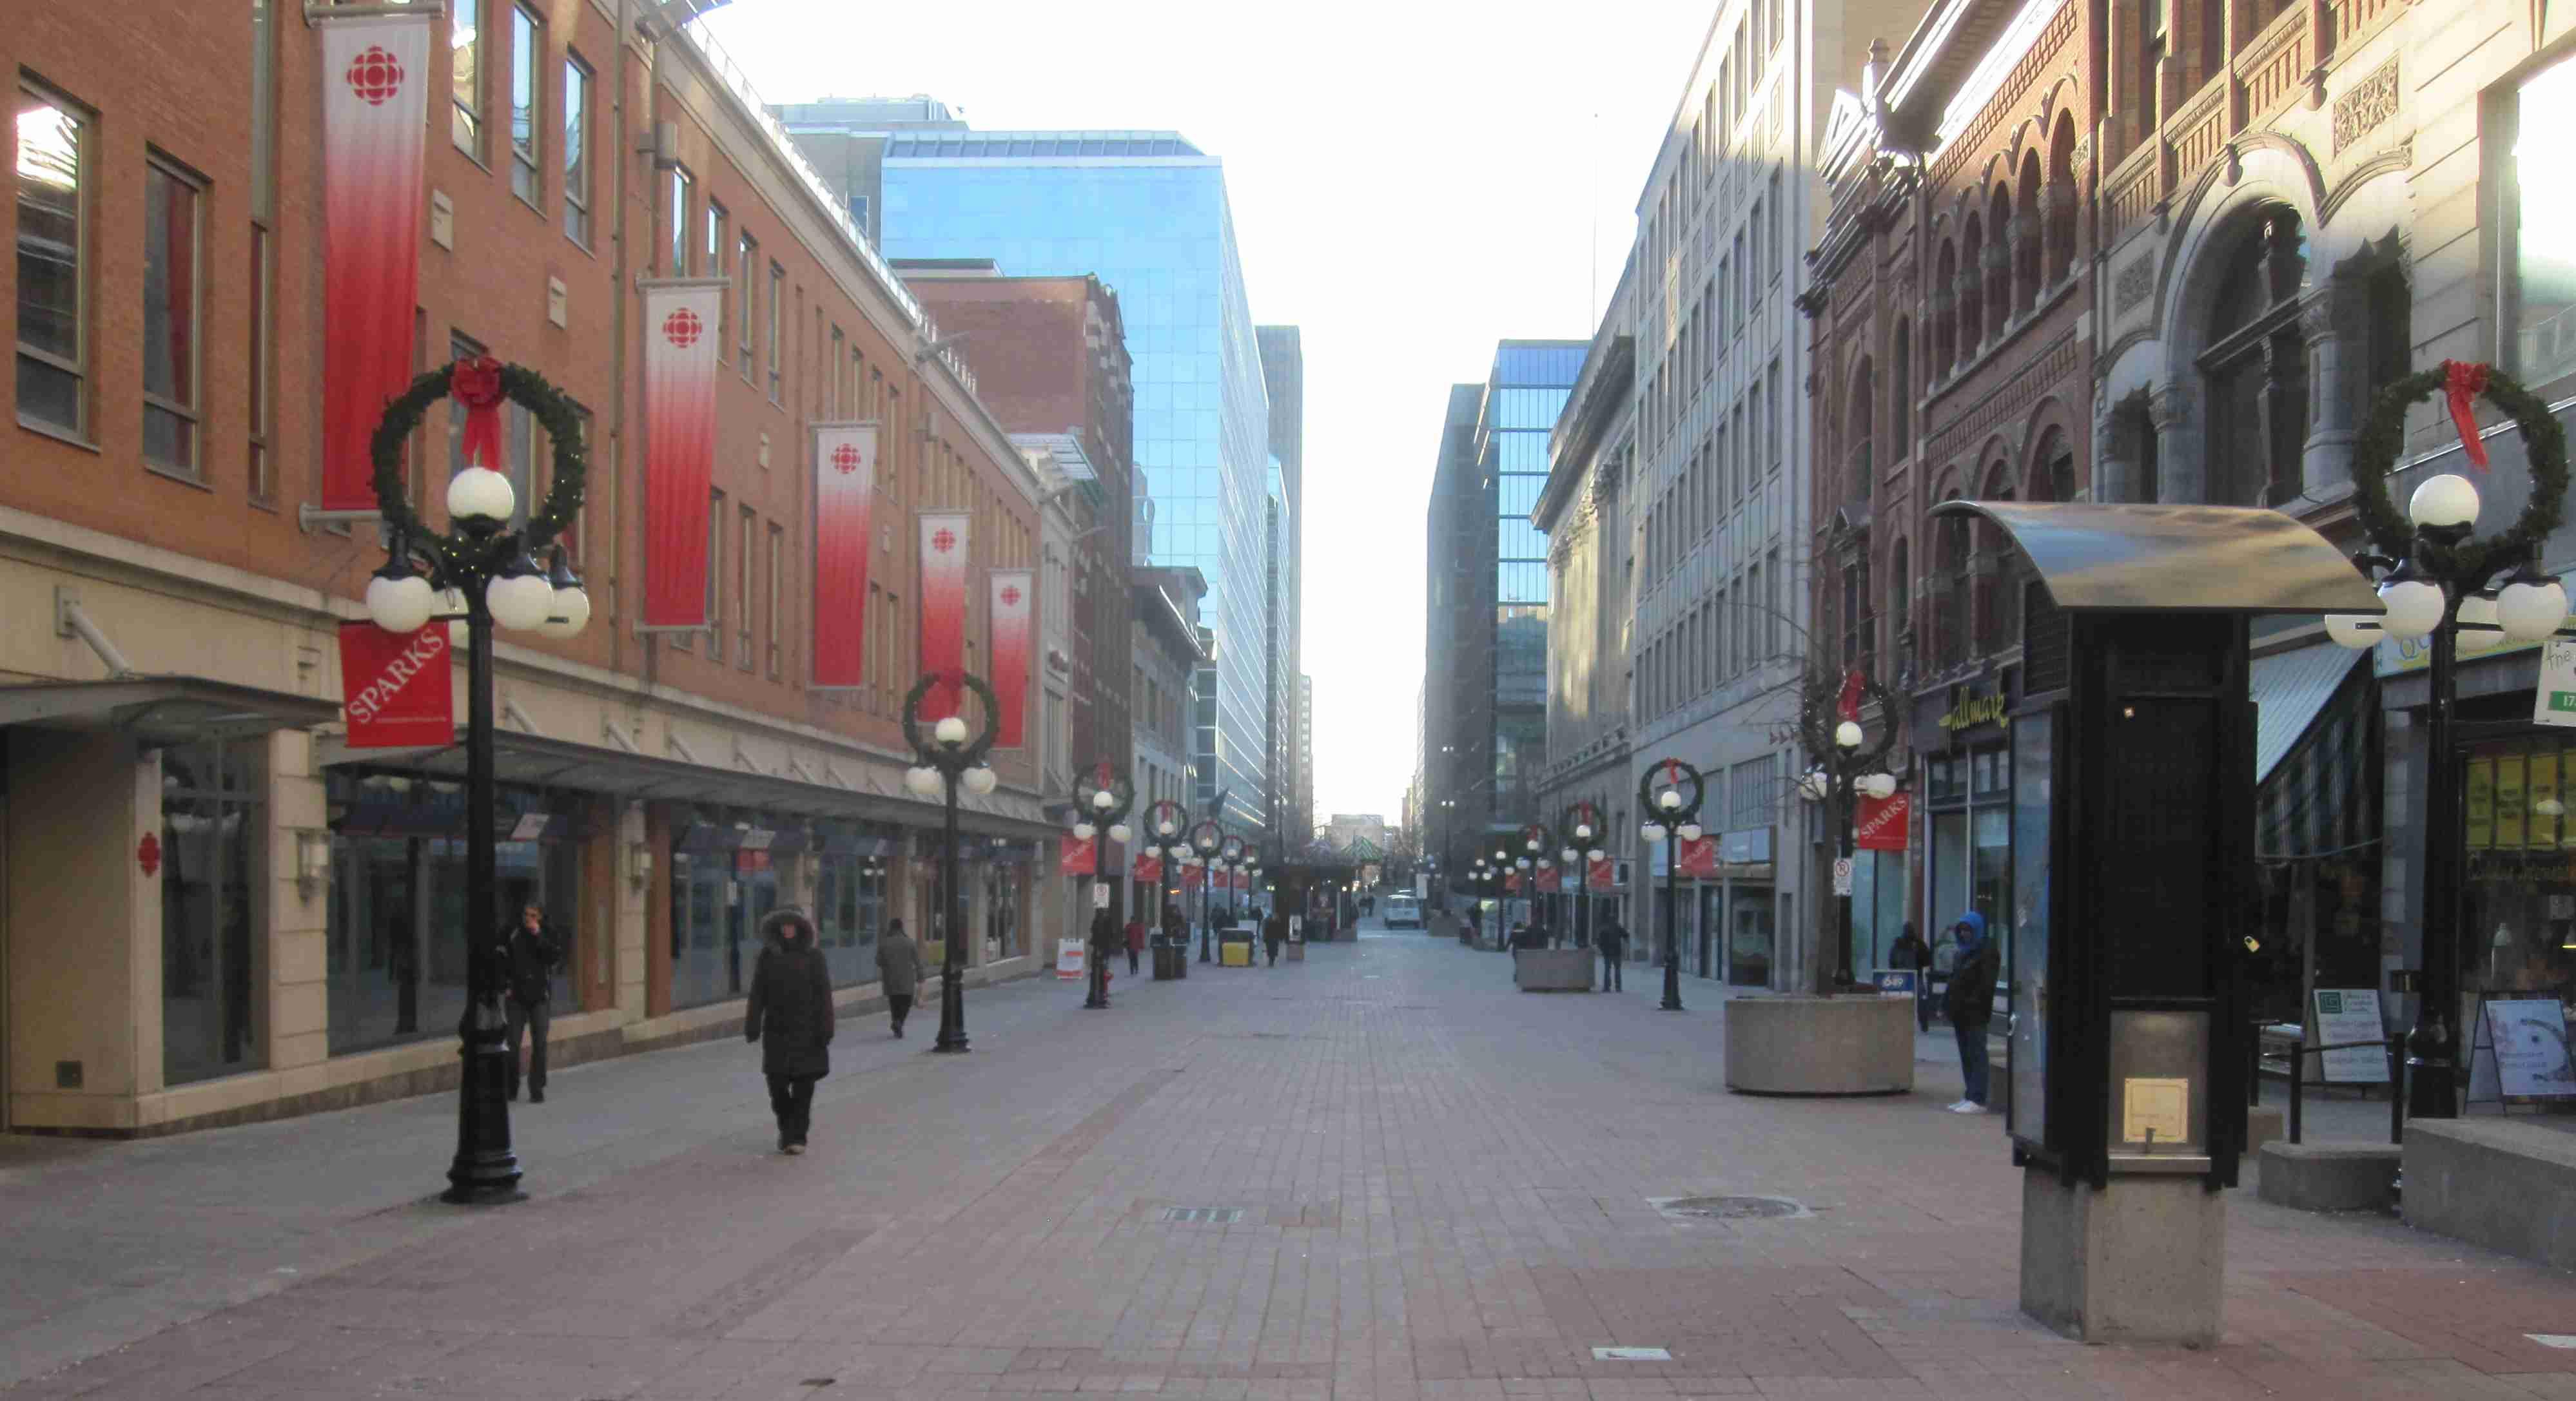 2011 12 20 urban commuter Ottawa 003